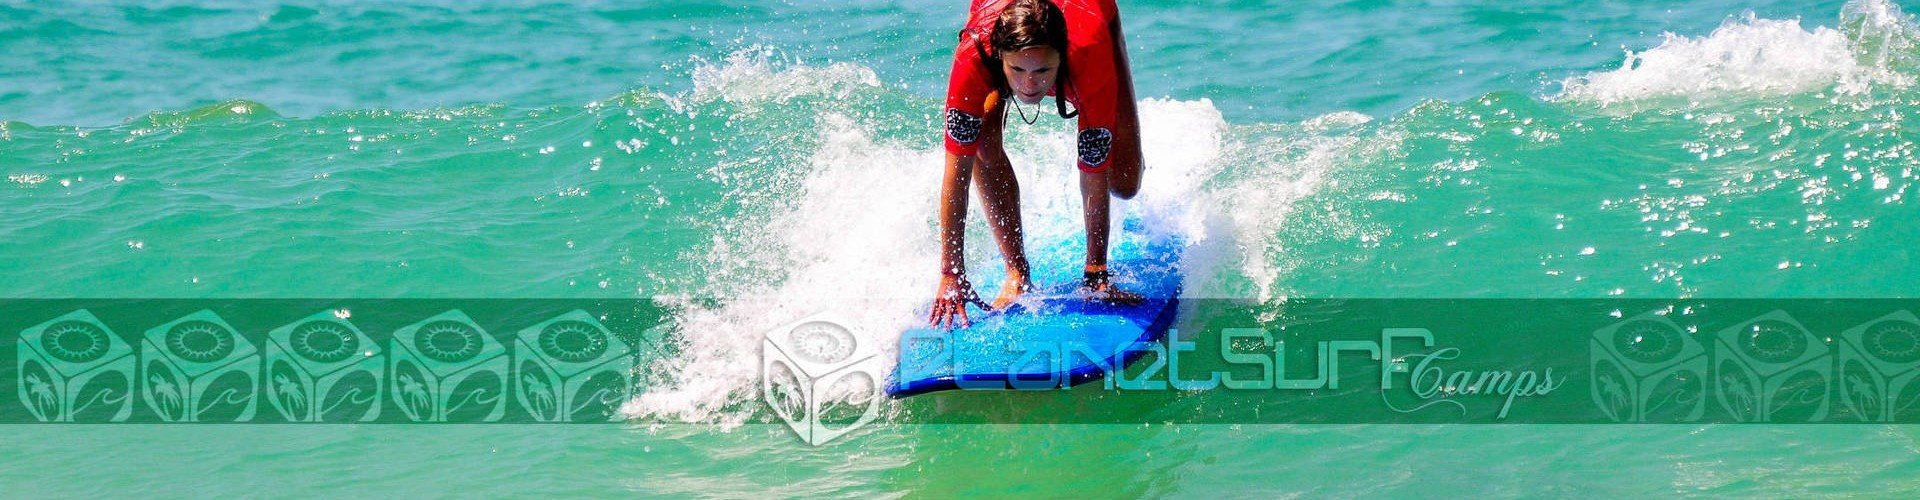 surfeando con un clima estupendo en Francia